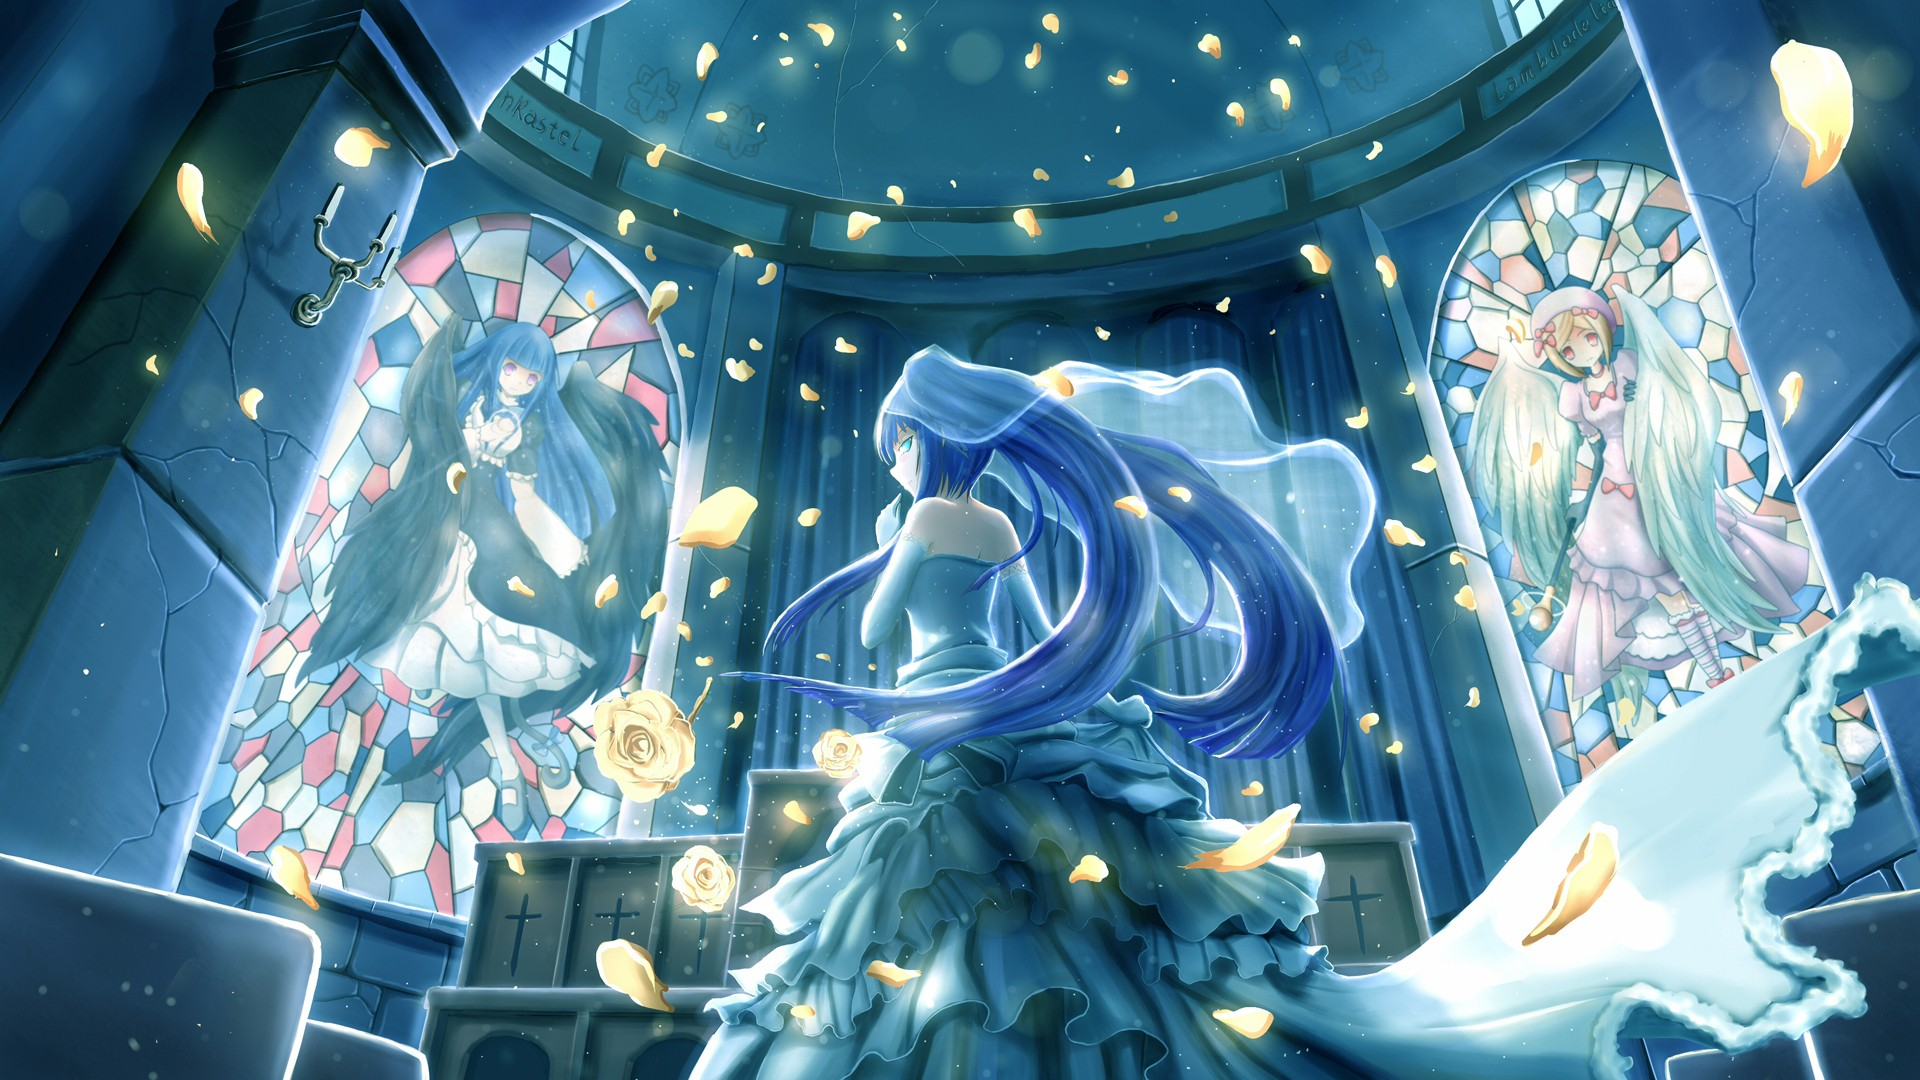 Anime Art Wallpaper (Part 19)